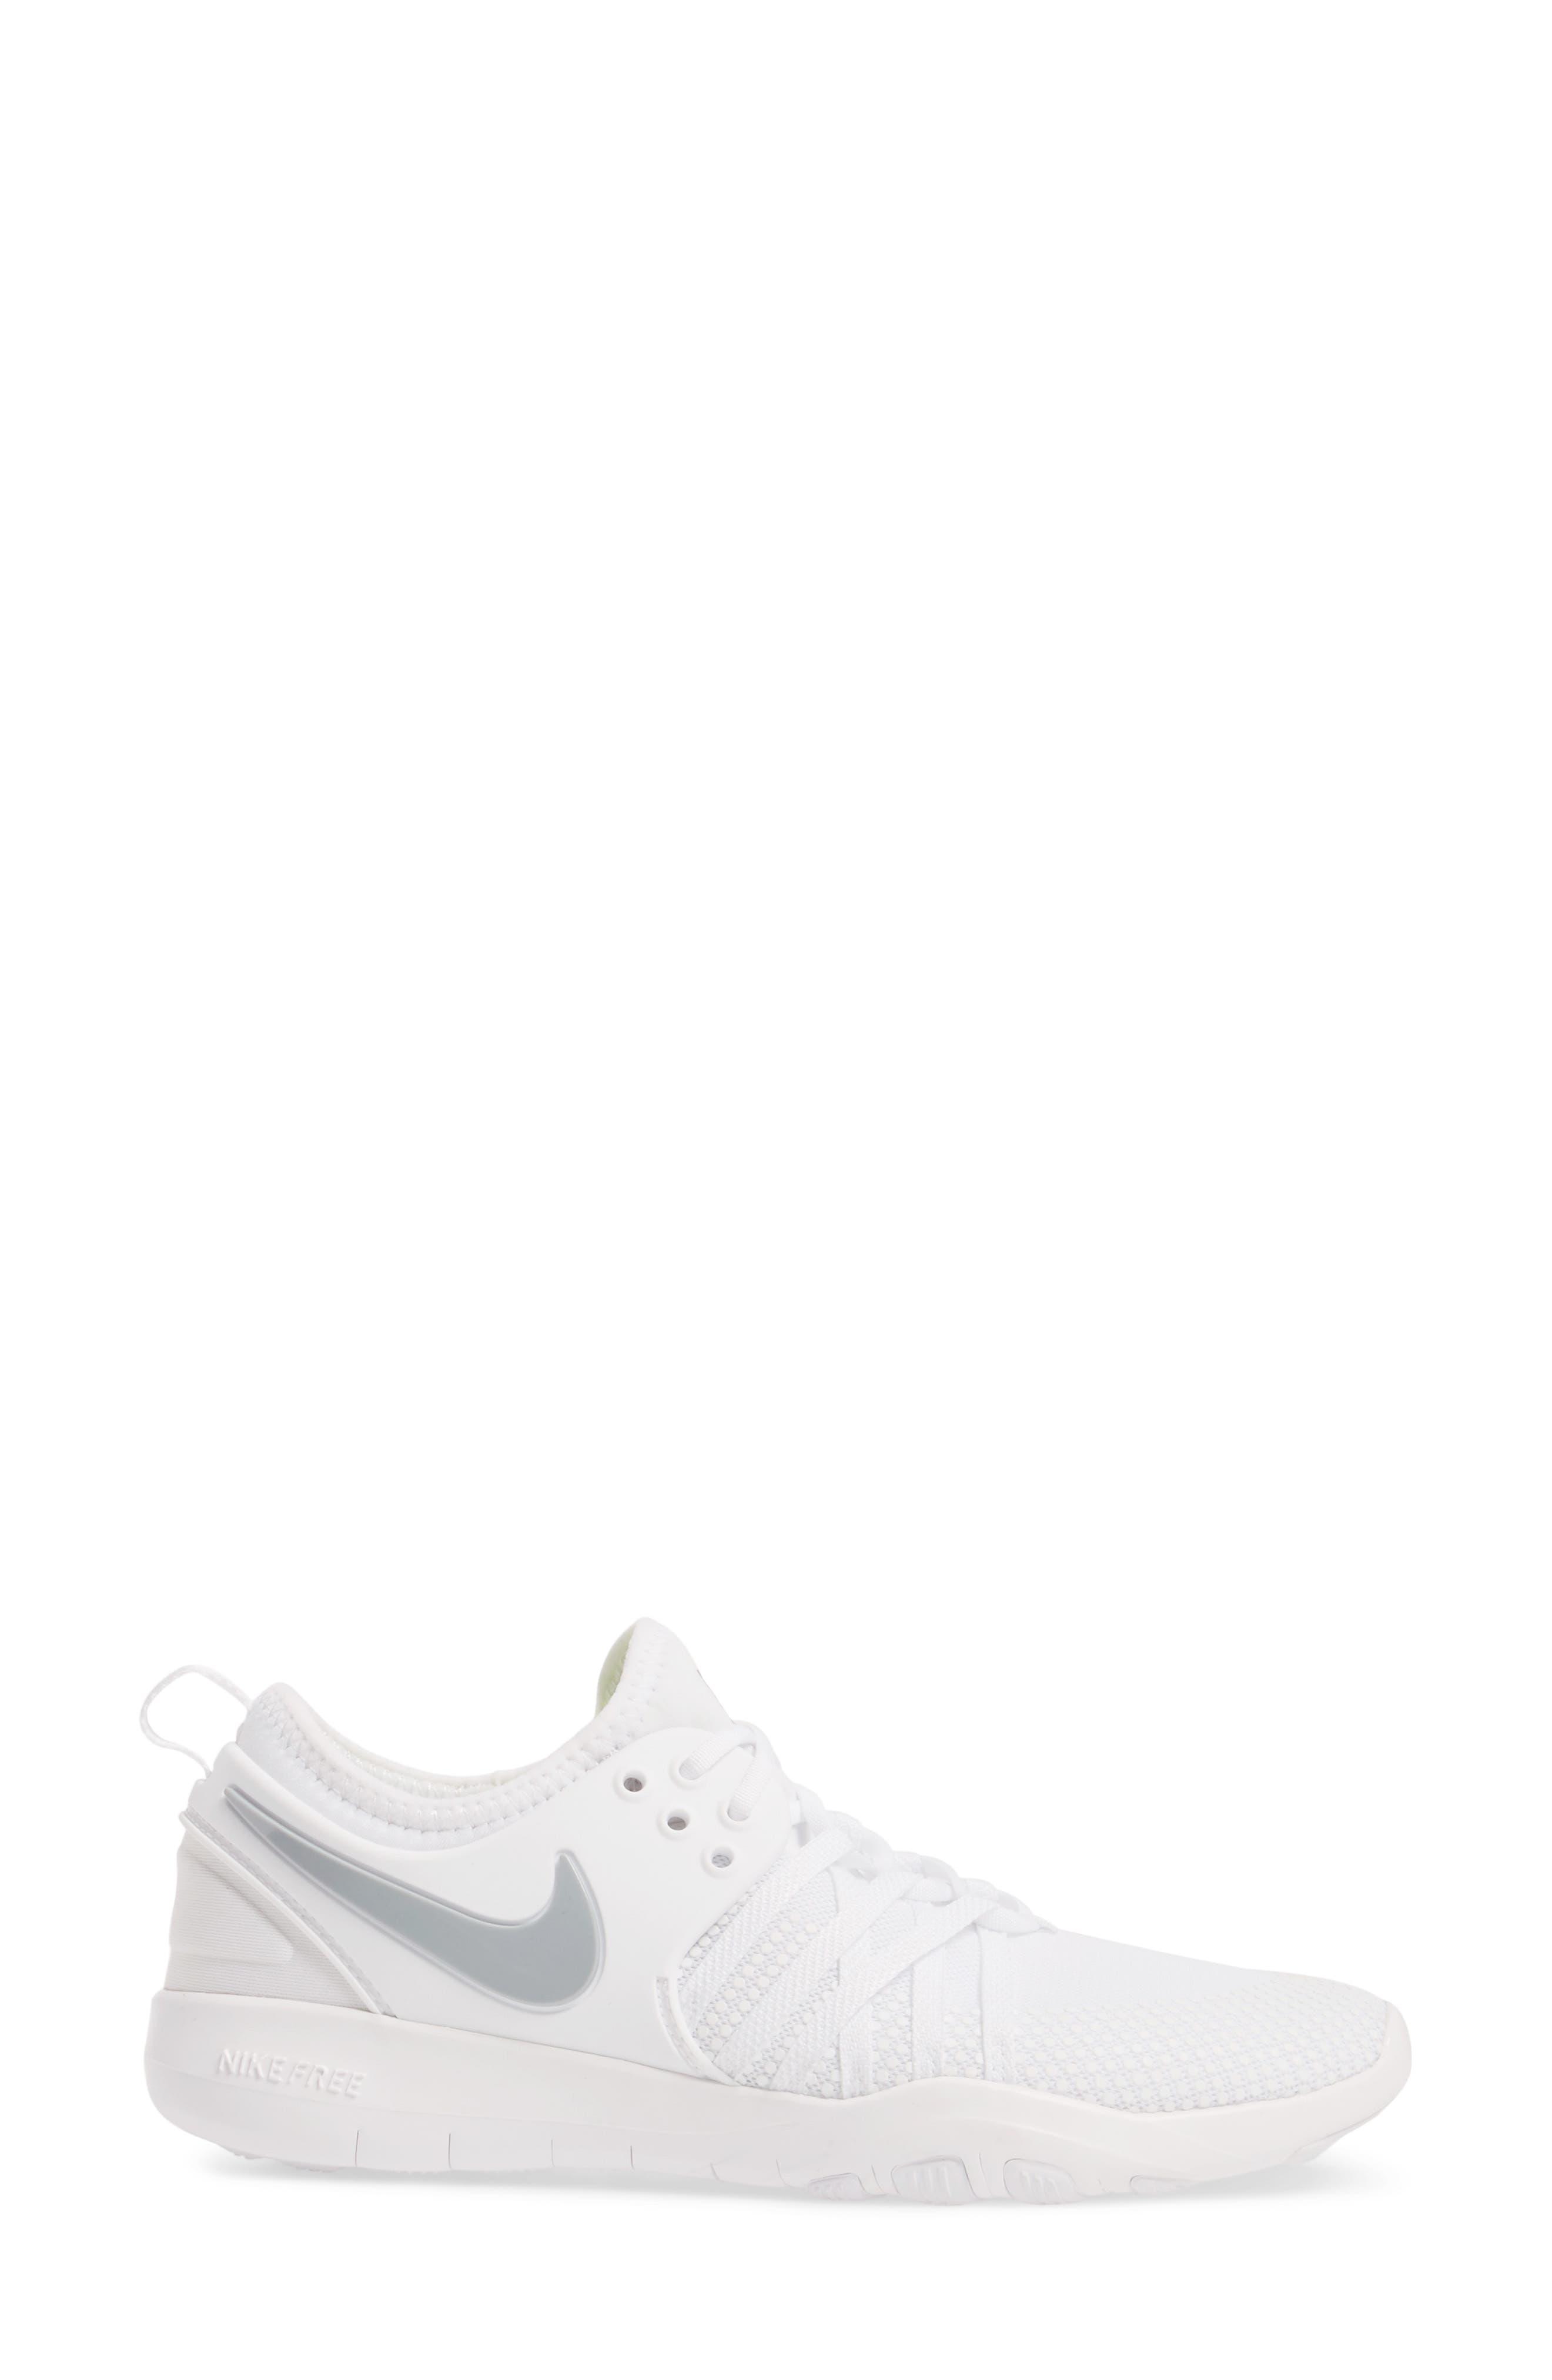 Free TR 7 Training Shoe,                             Alternate thumbnail 3, color,                             White/ Metallic Silver